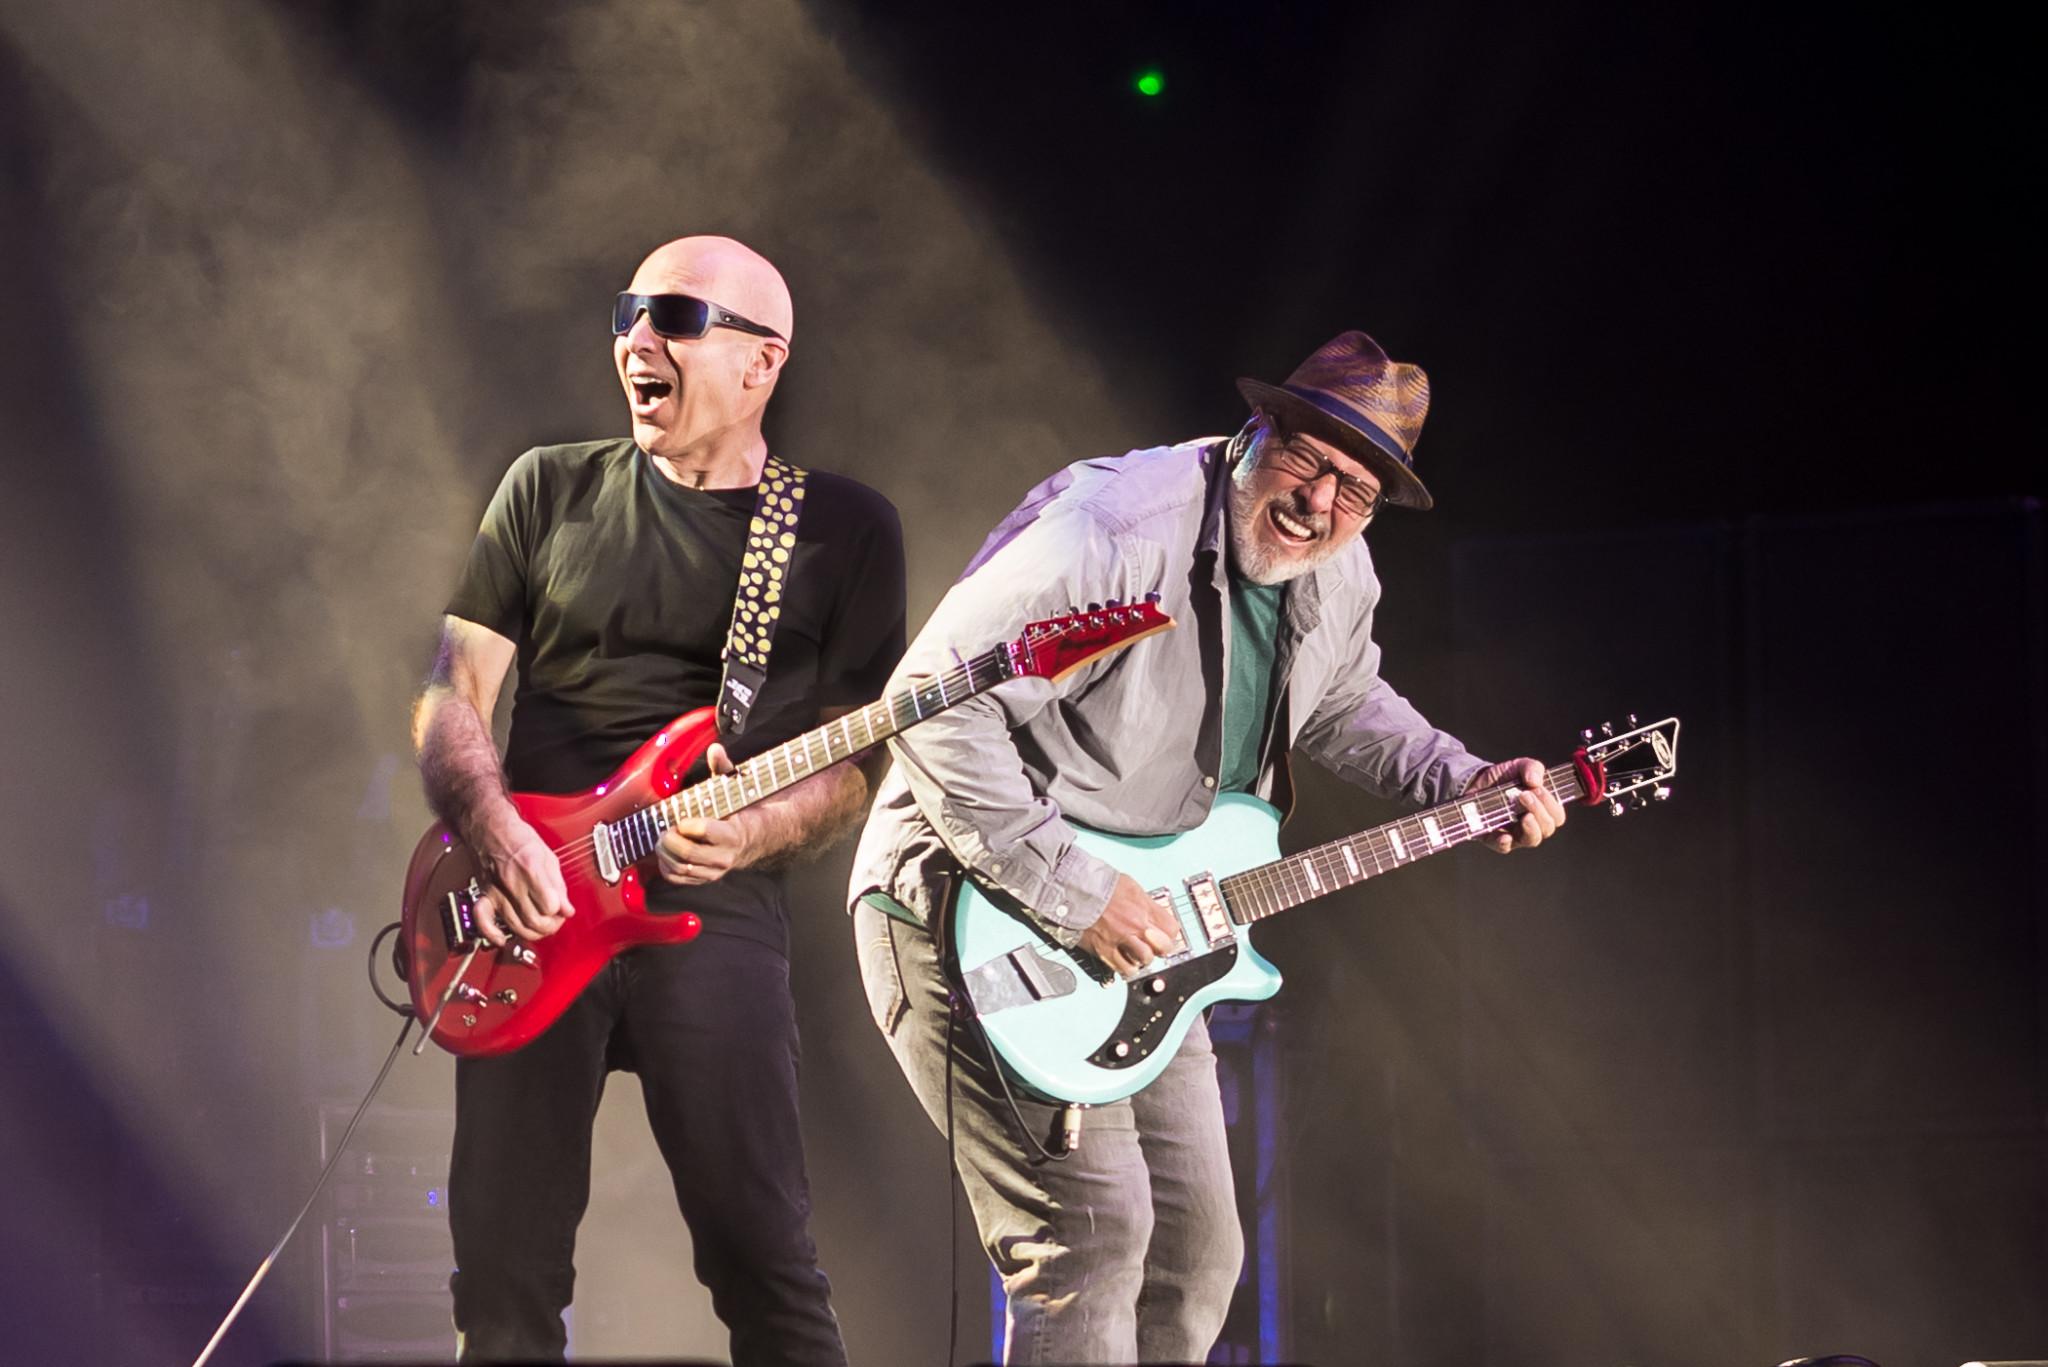 Joe Satriani, Koncert, Guitar; Concert,G3; Gitara; Polska;